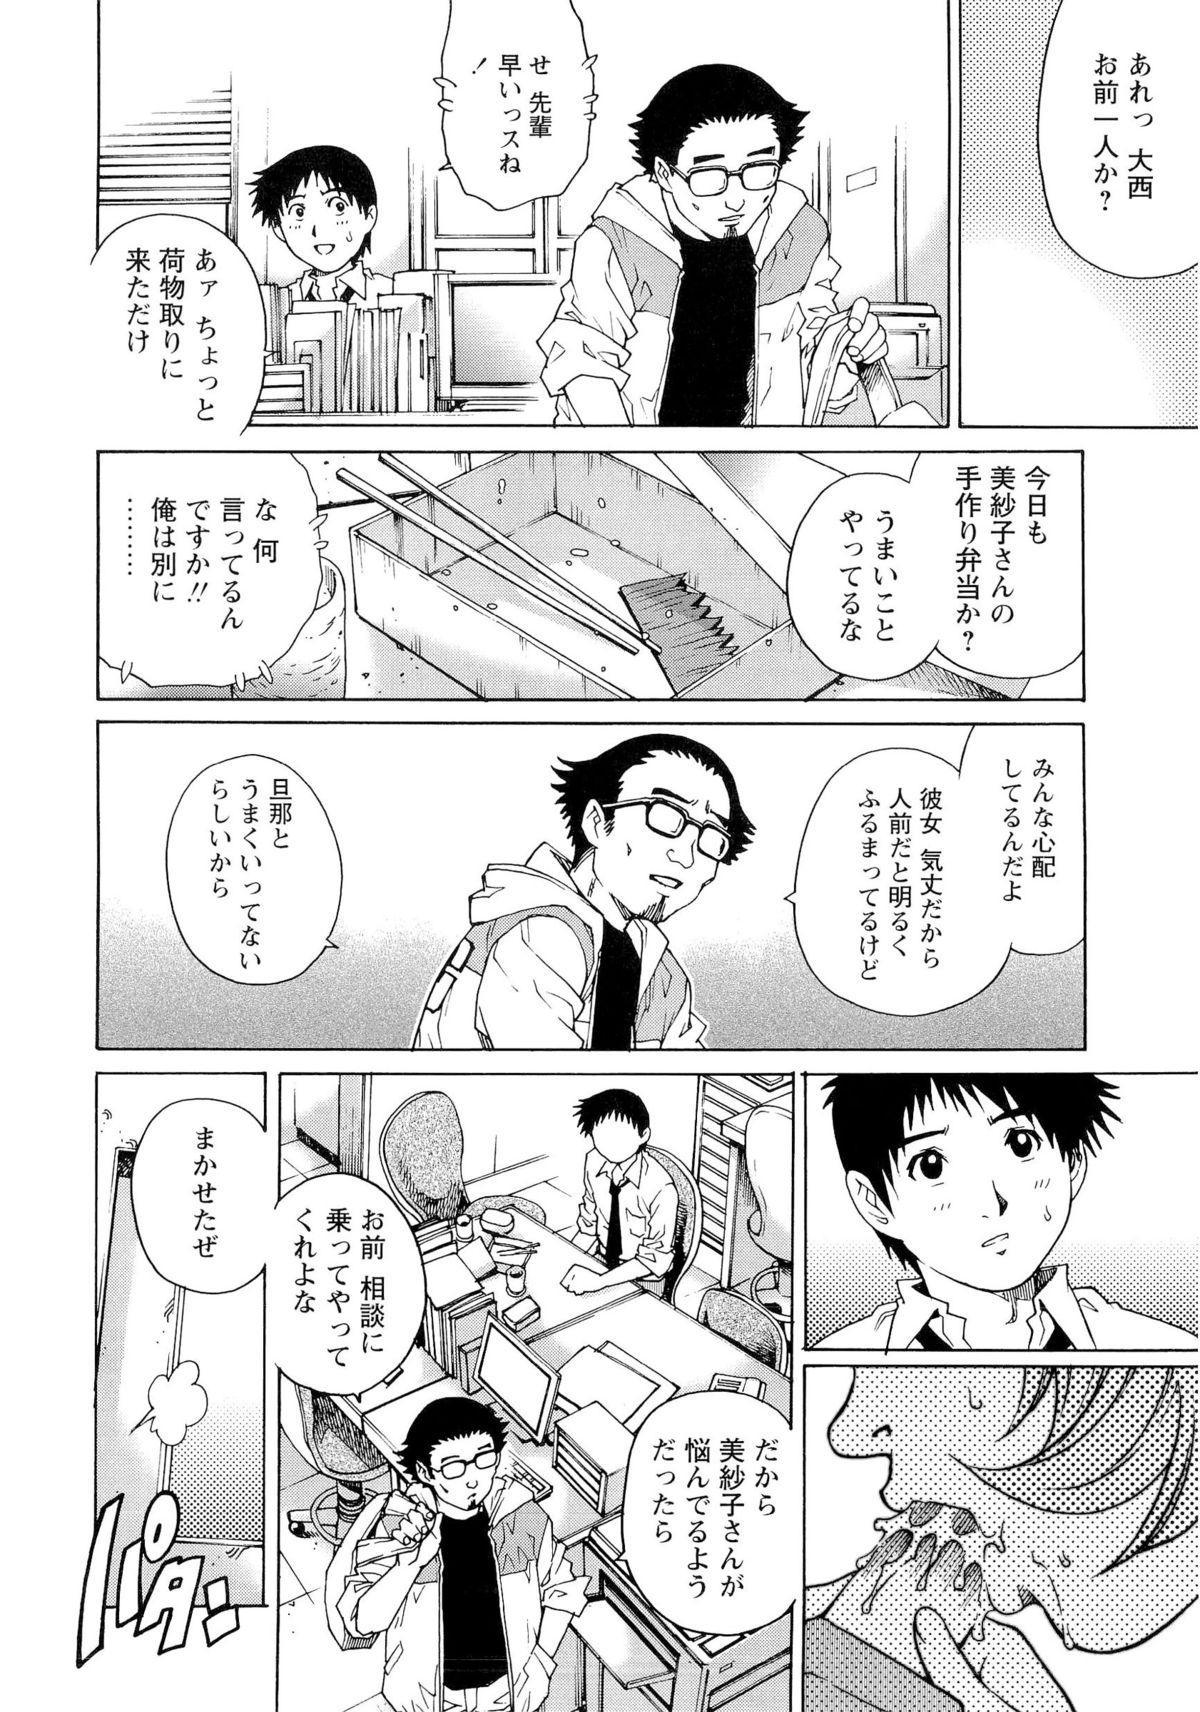 Nureteru Hitozuma - Wetly Wife 32